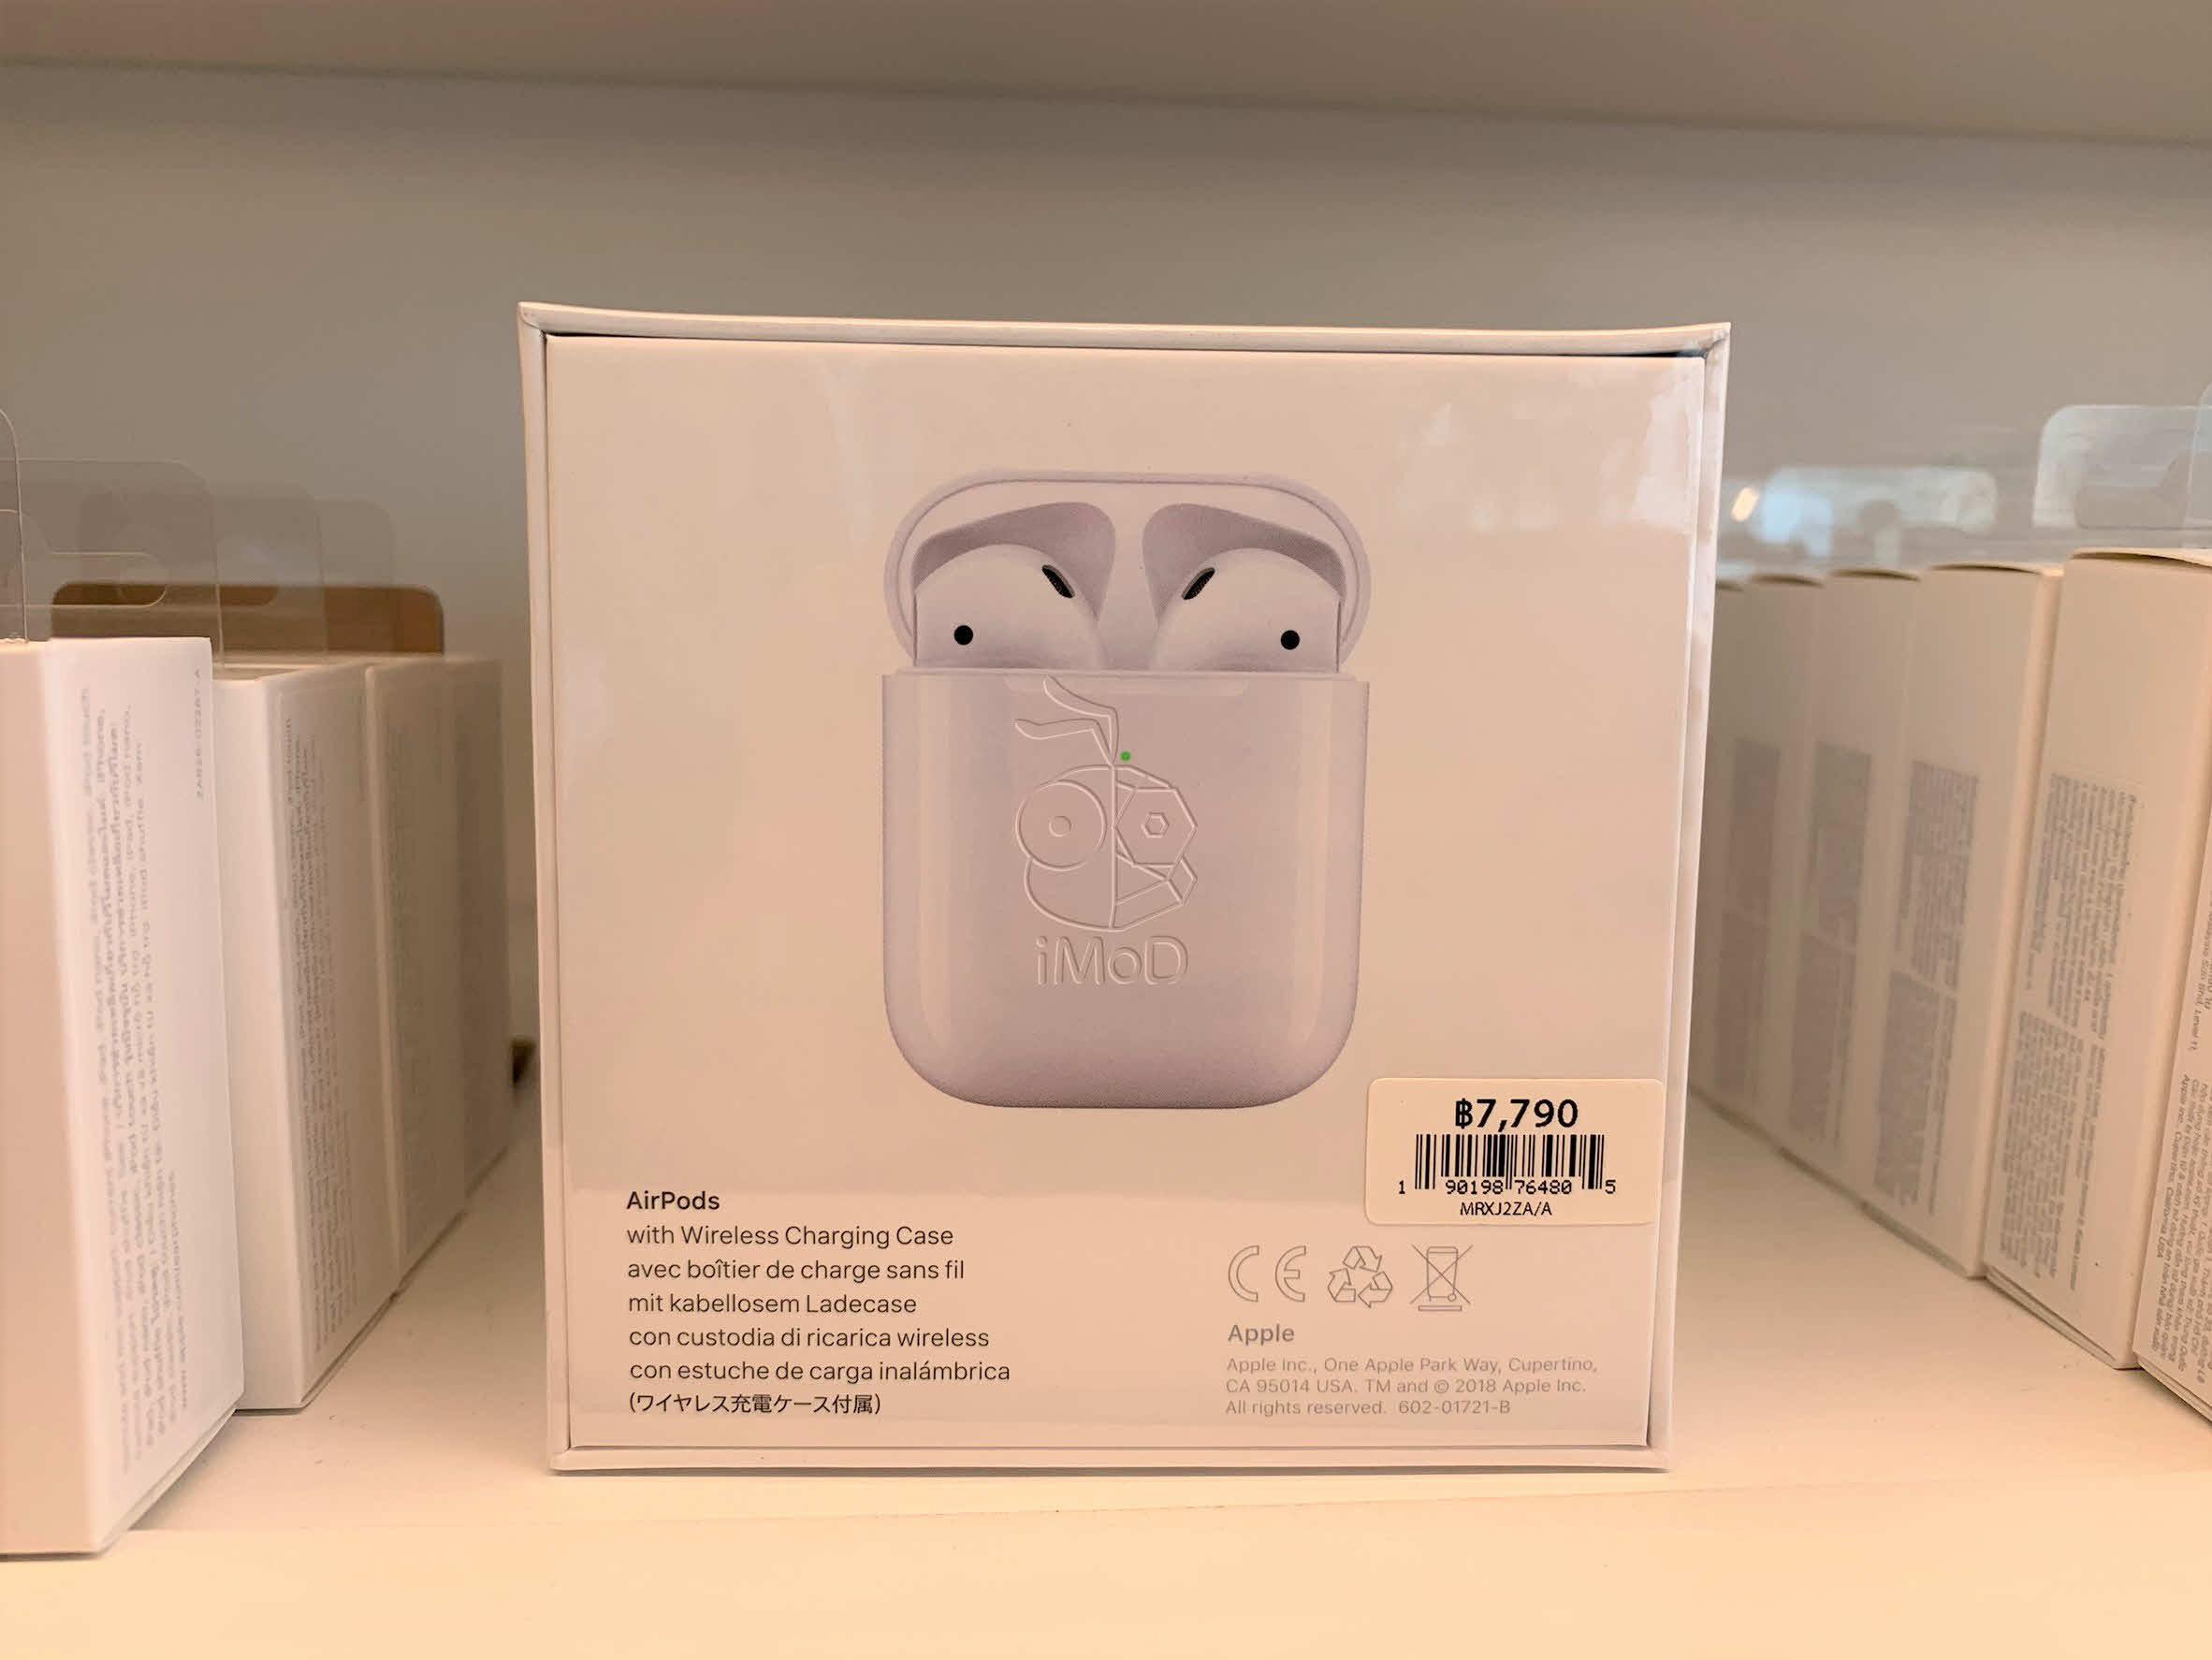 Ipad Mini Gen 5 Ipad Air Gen 3 Airpods 2 Avaliable Apple Iconsiam Img 7 1